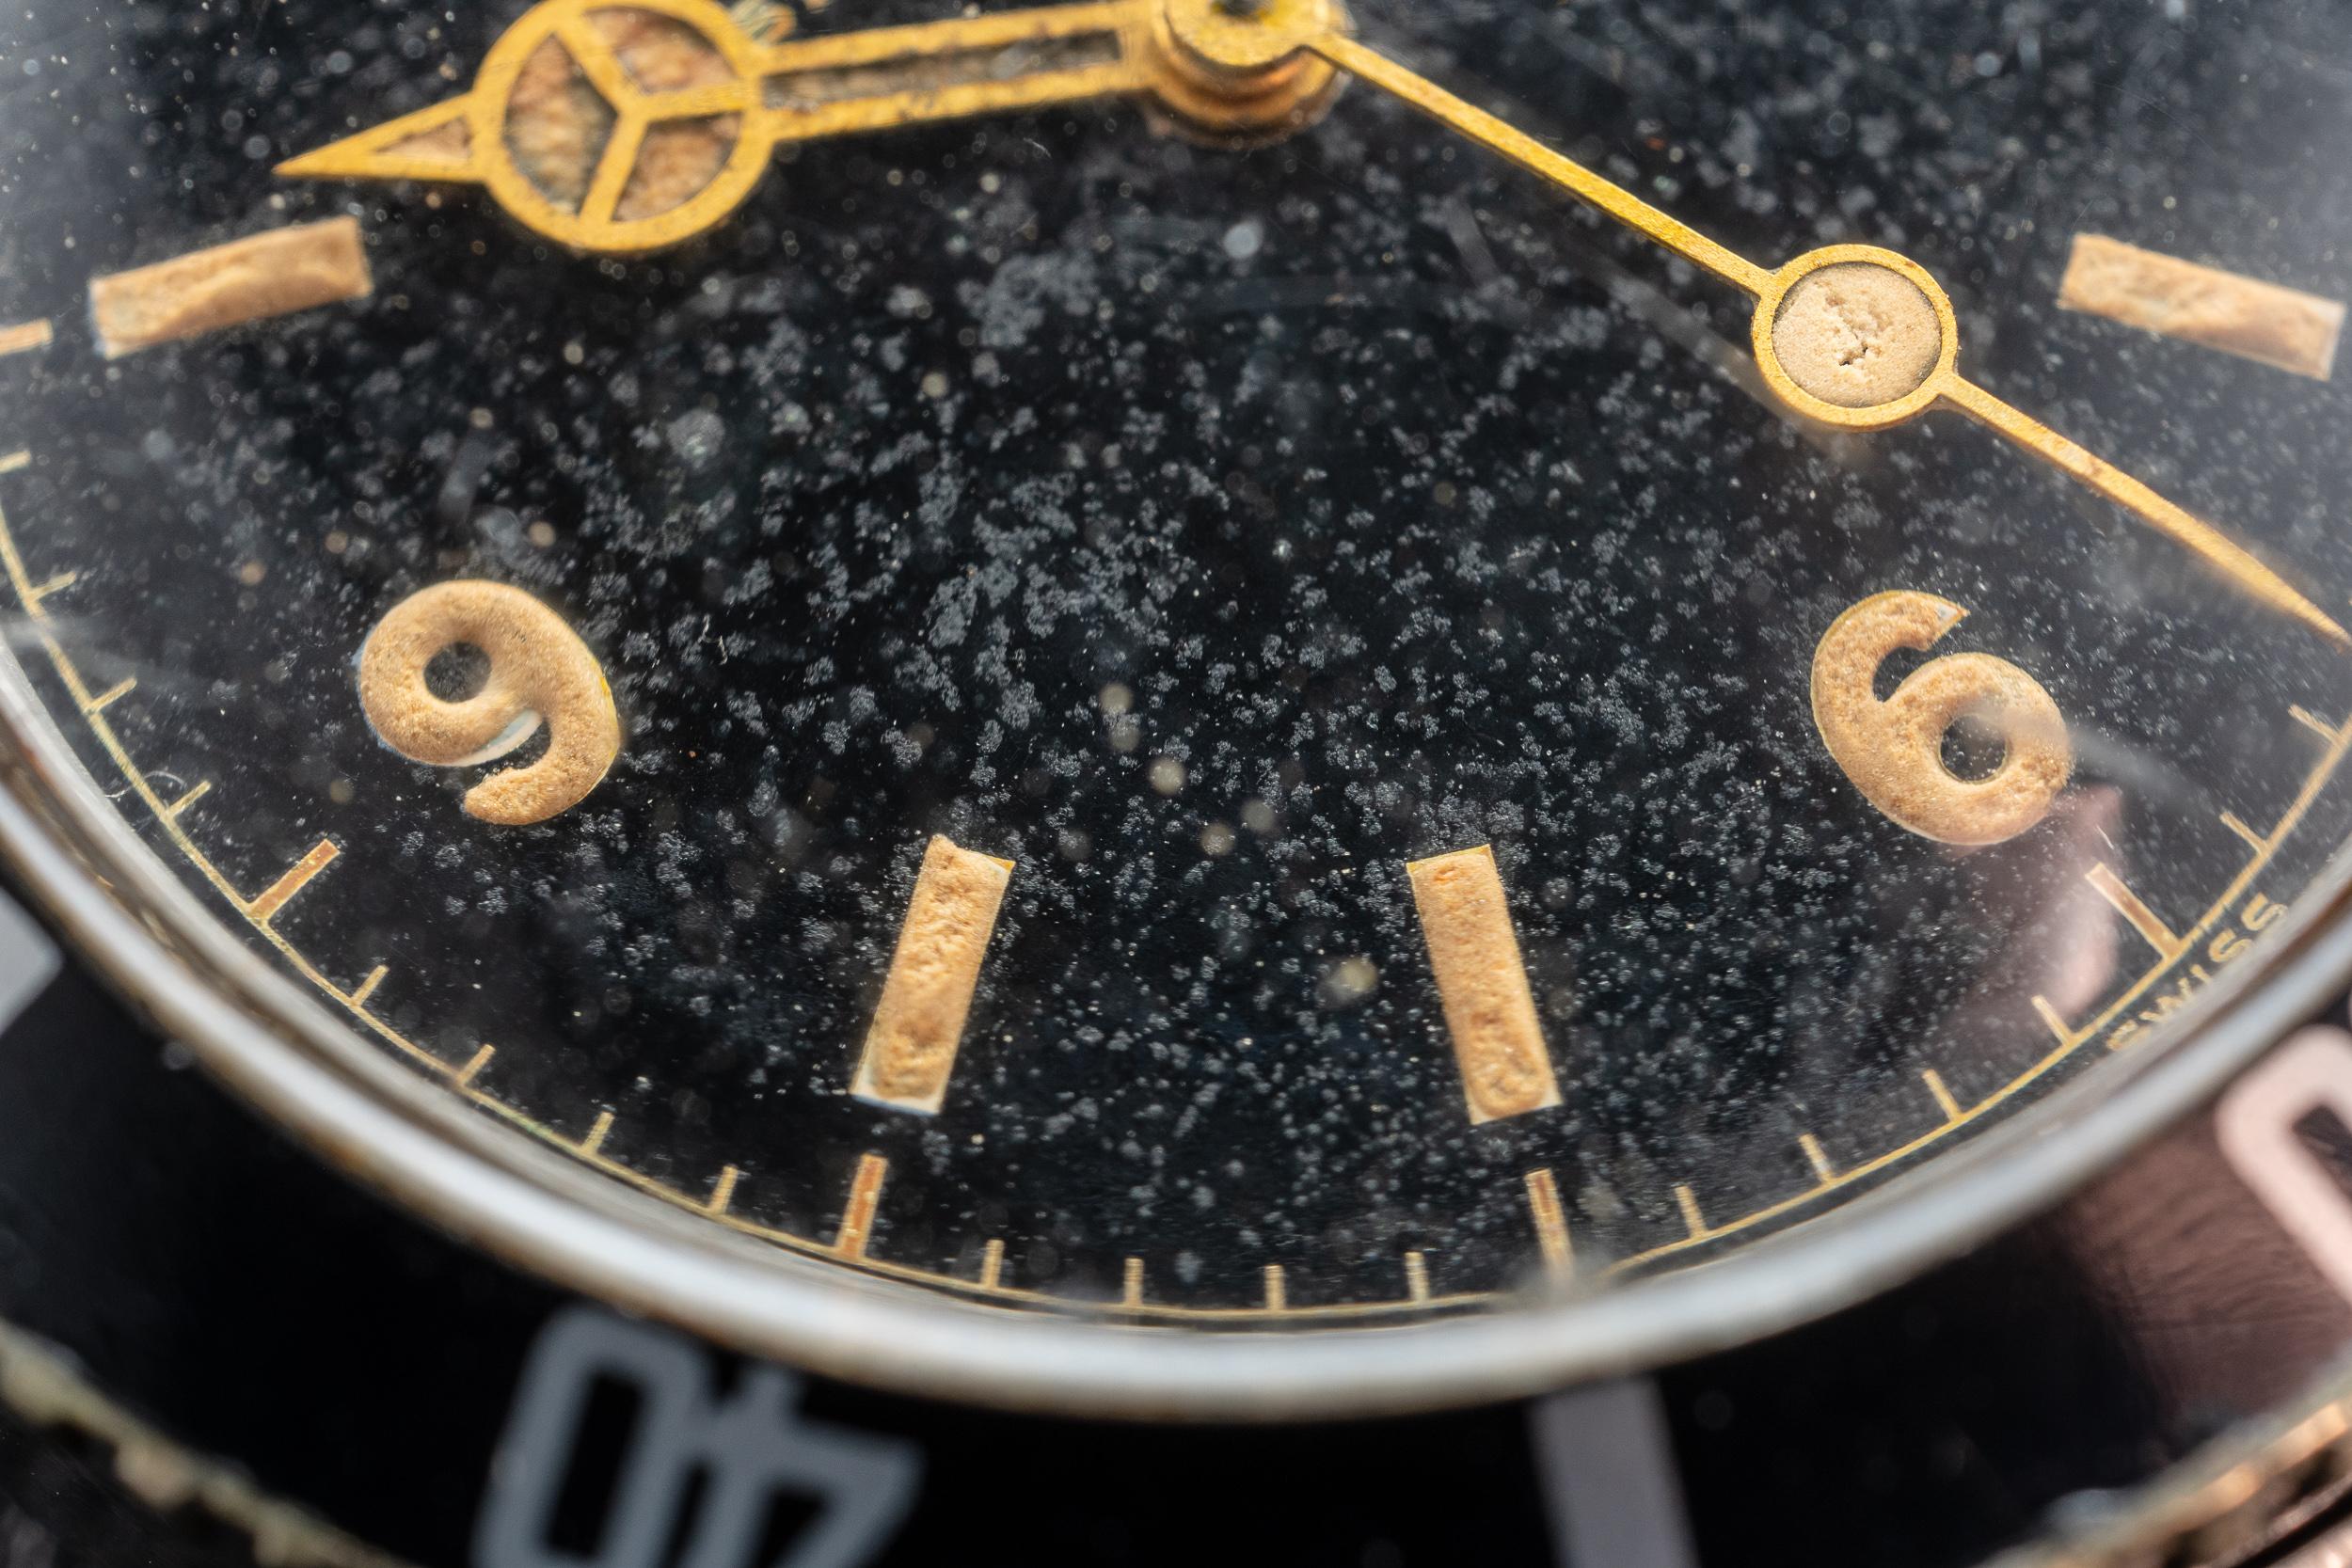 Rolex_Vintage_Submariner_Explorer_Dial.jpg